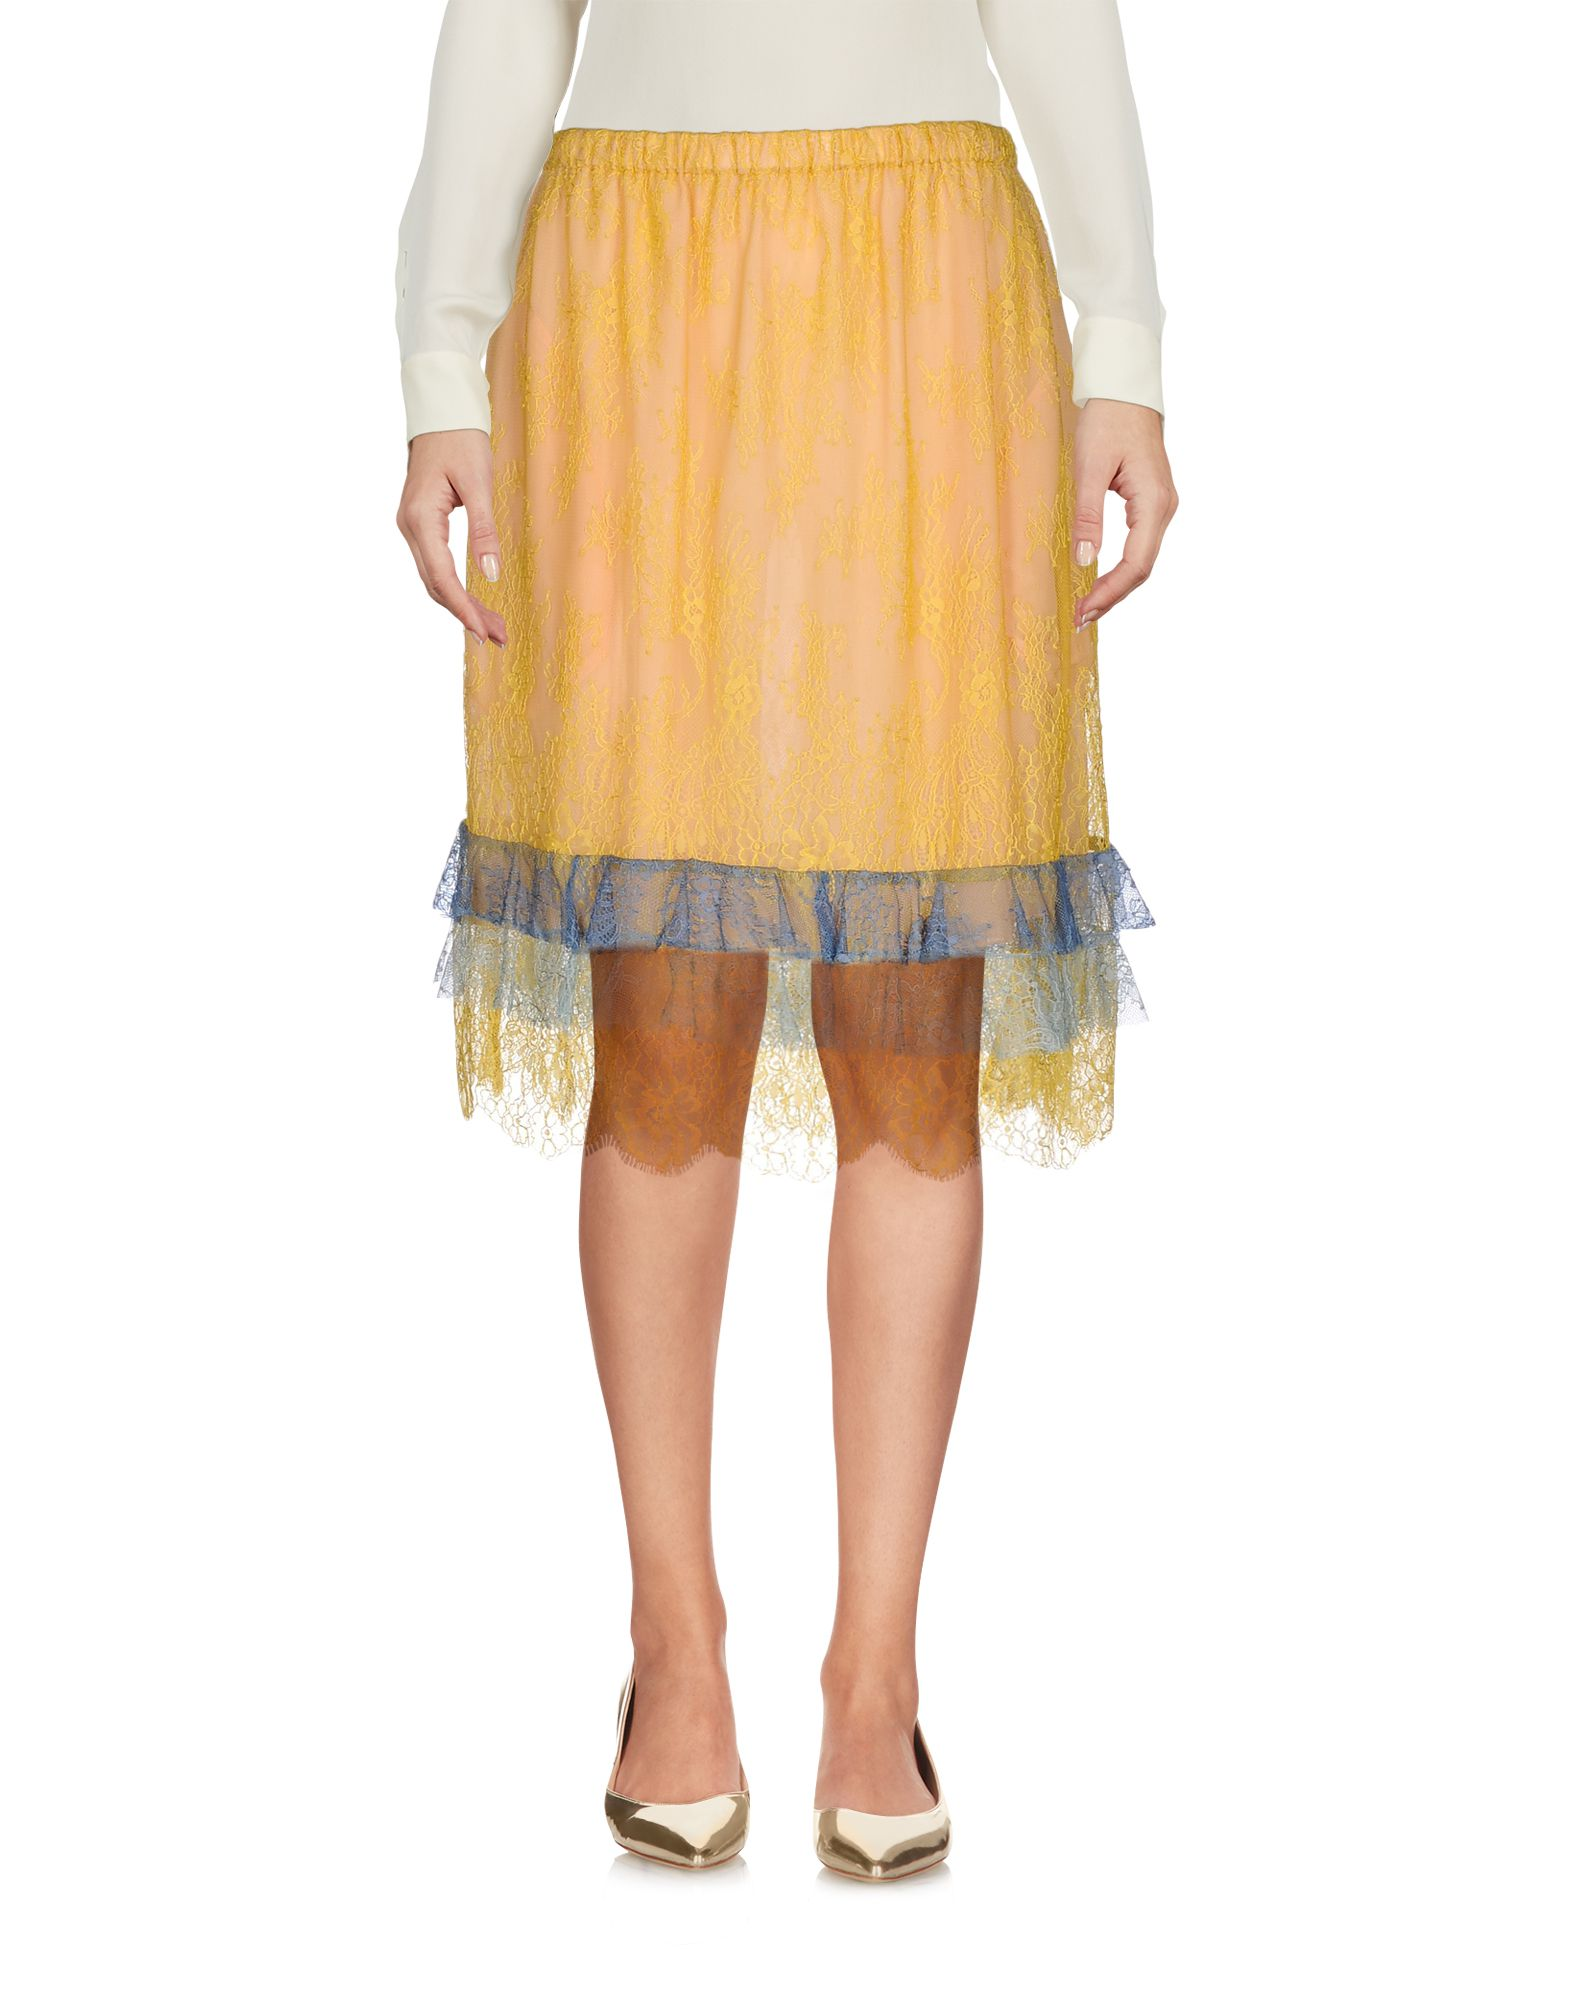 PHILOSOPHY di LORENZO SERAFINI Damen Knielanger Rock Farbe Gelb Größe 6 jetztbilligerkaufen